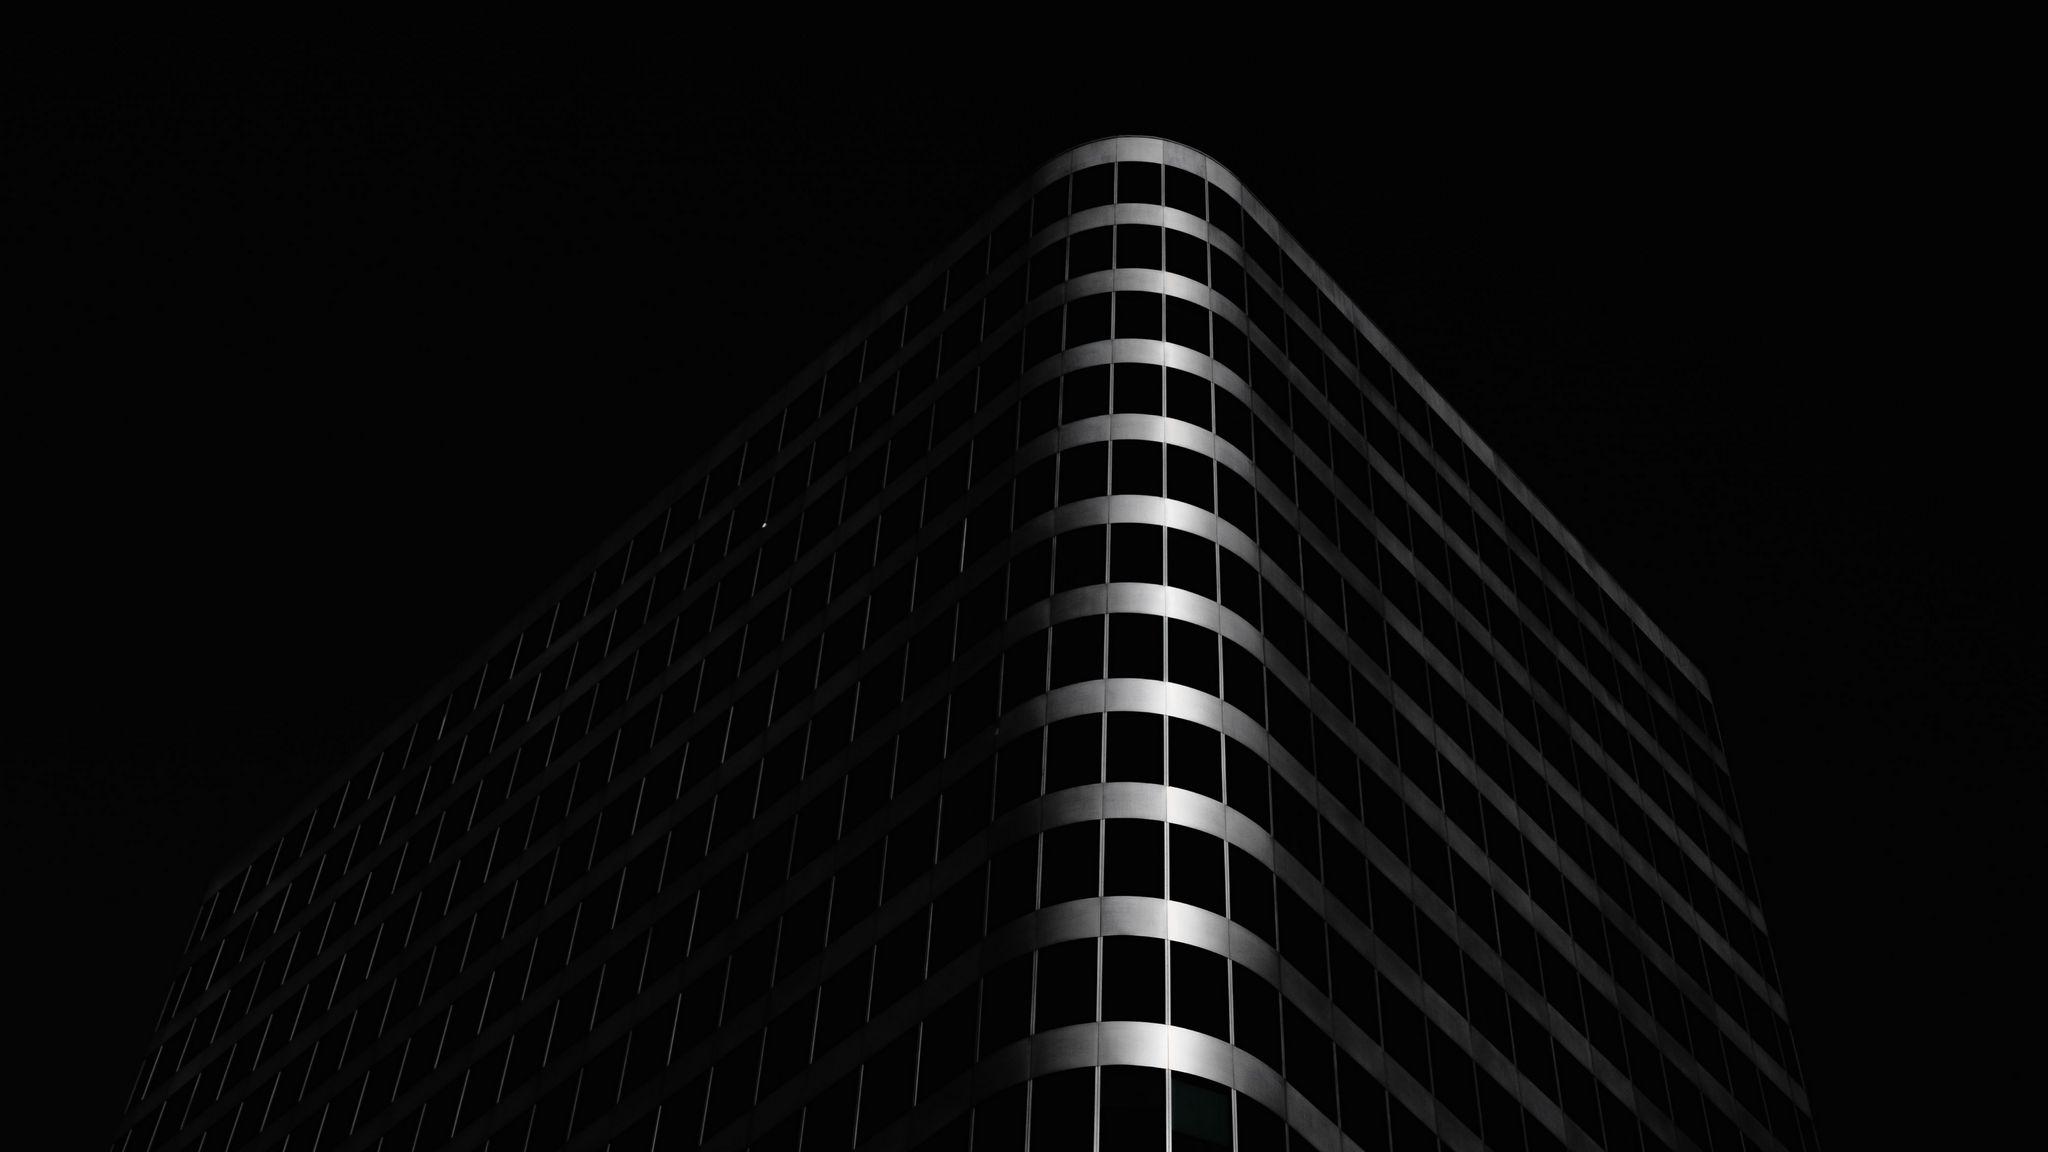 2048x1152 Wallpaper building, architecture, black, dark